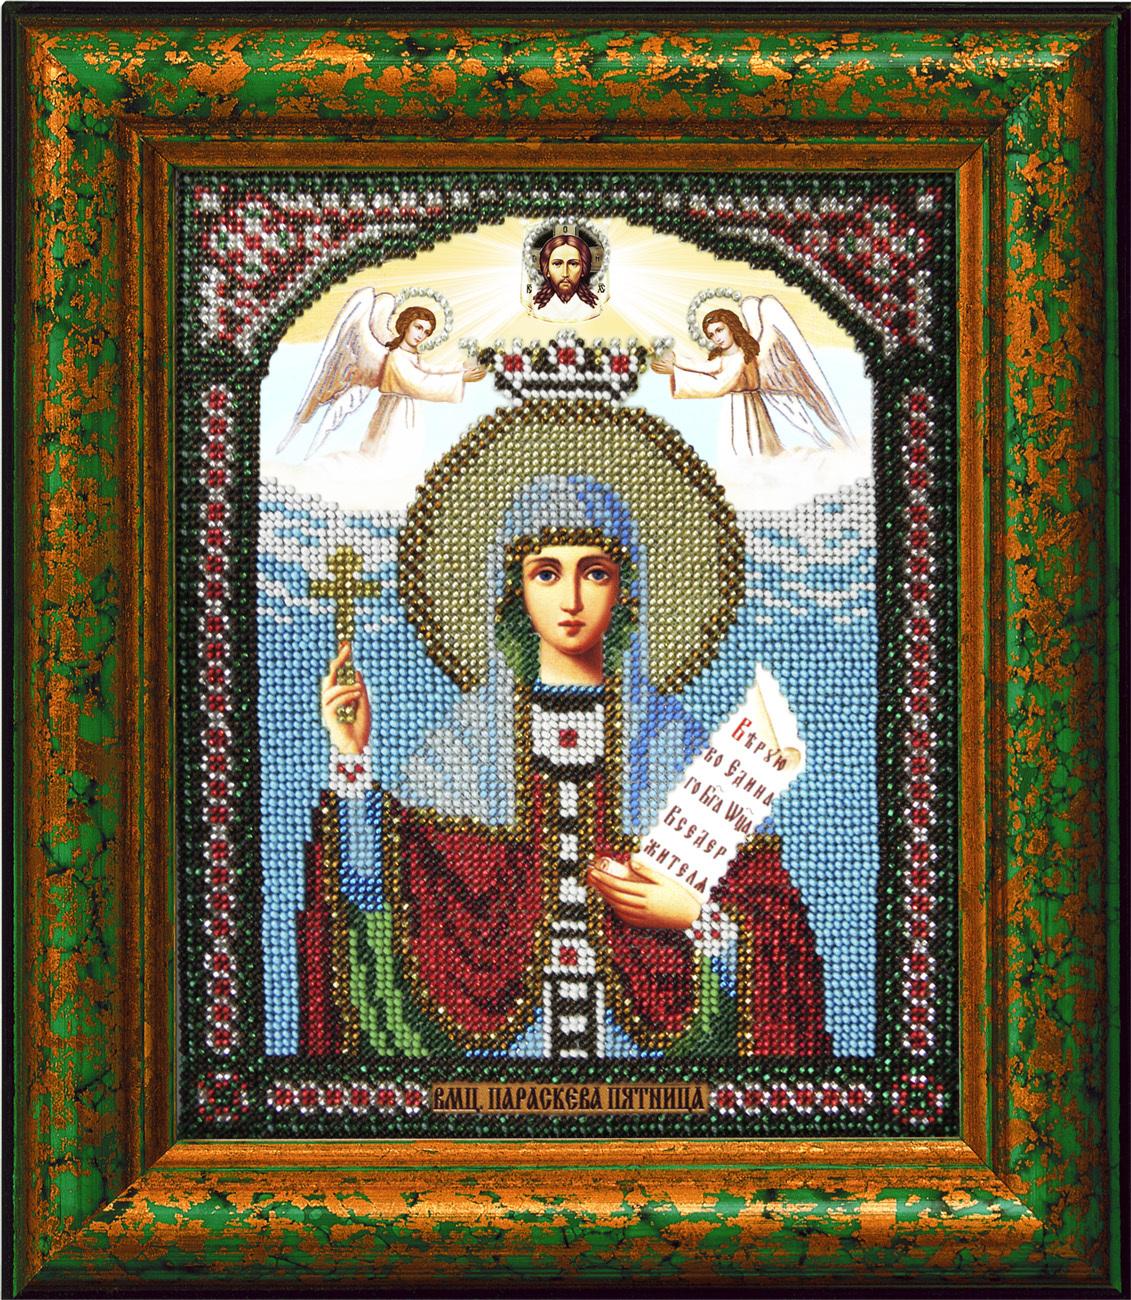 ... : Икона Святая Параскева-Пятница: www.beadicons.ru/catalog/t107.html